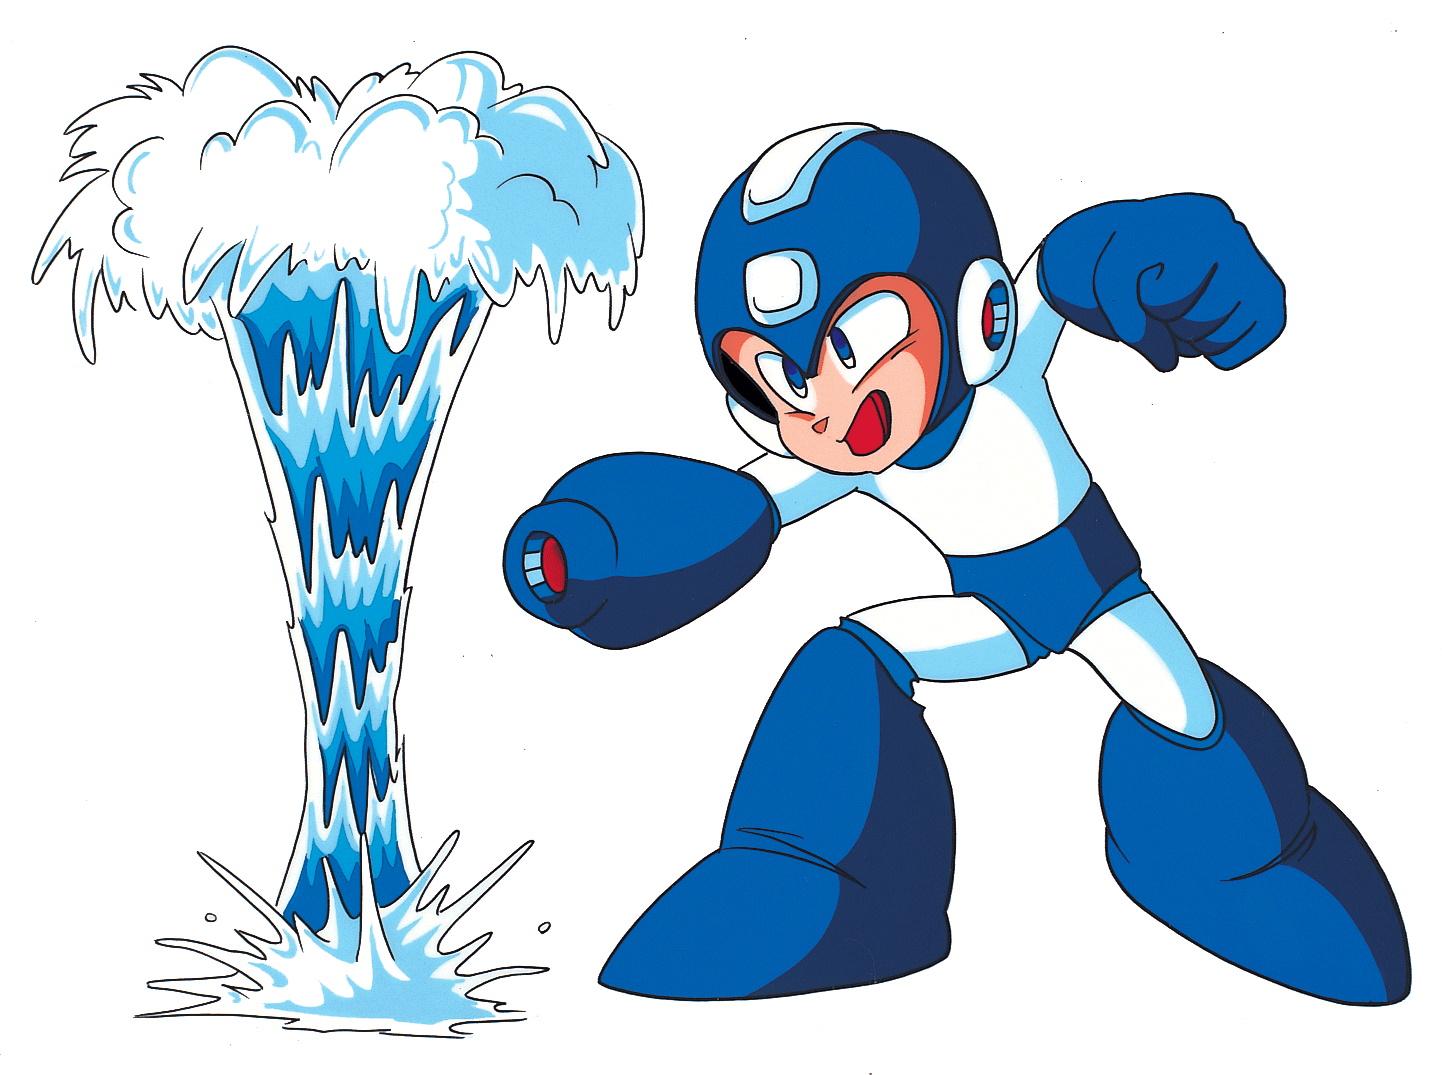 Water wave mega man hq fandom powered by wikia - Megaman wikia ...